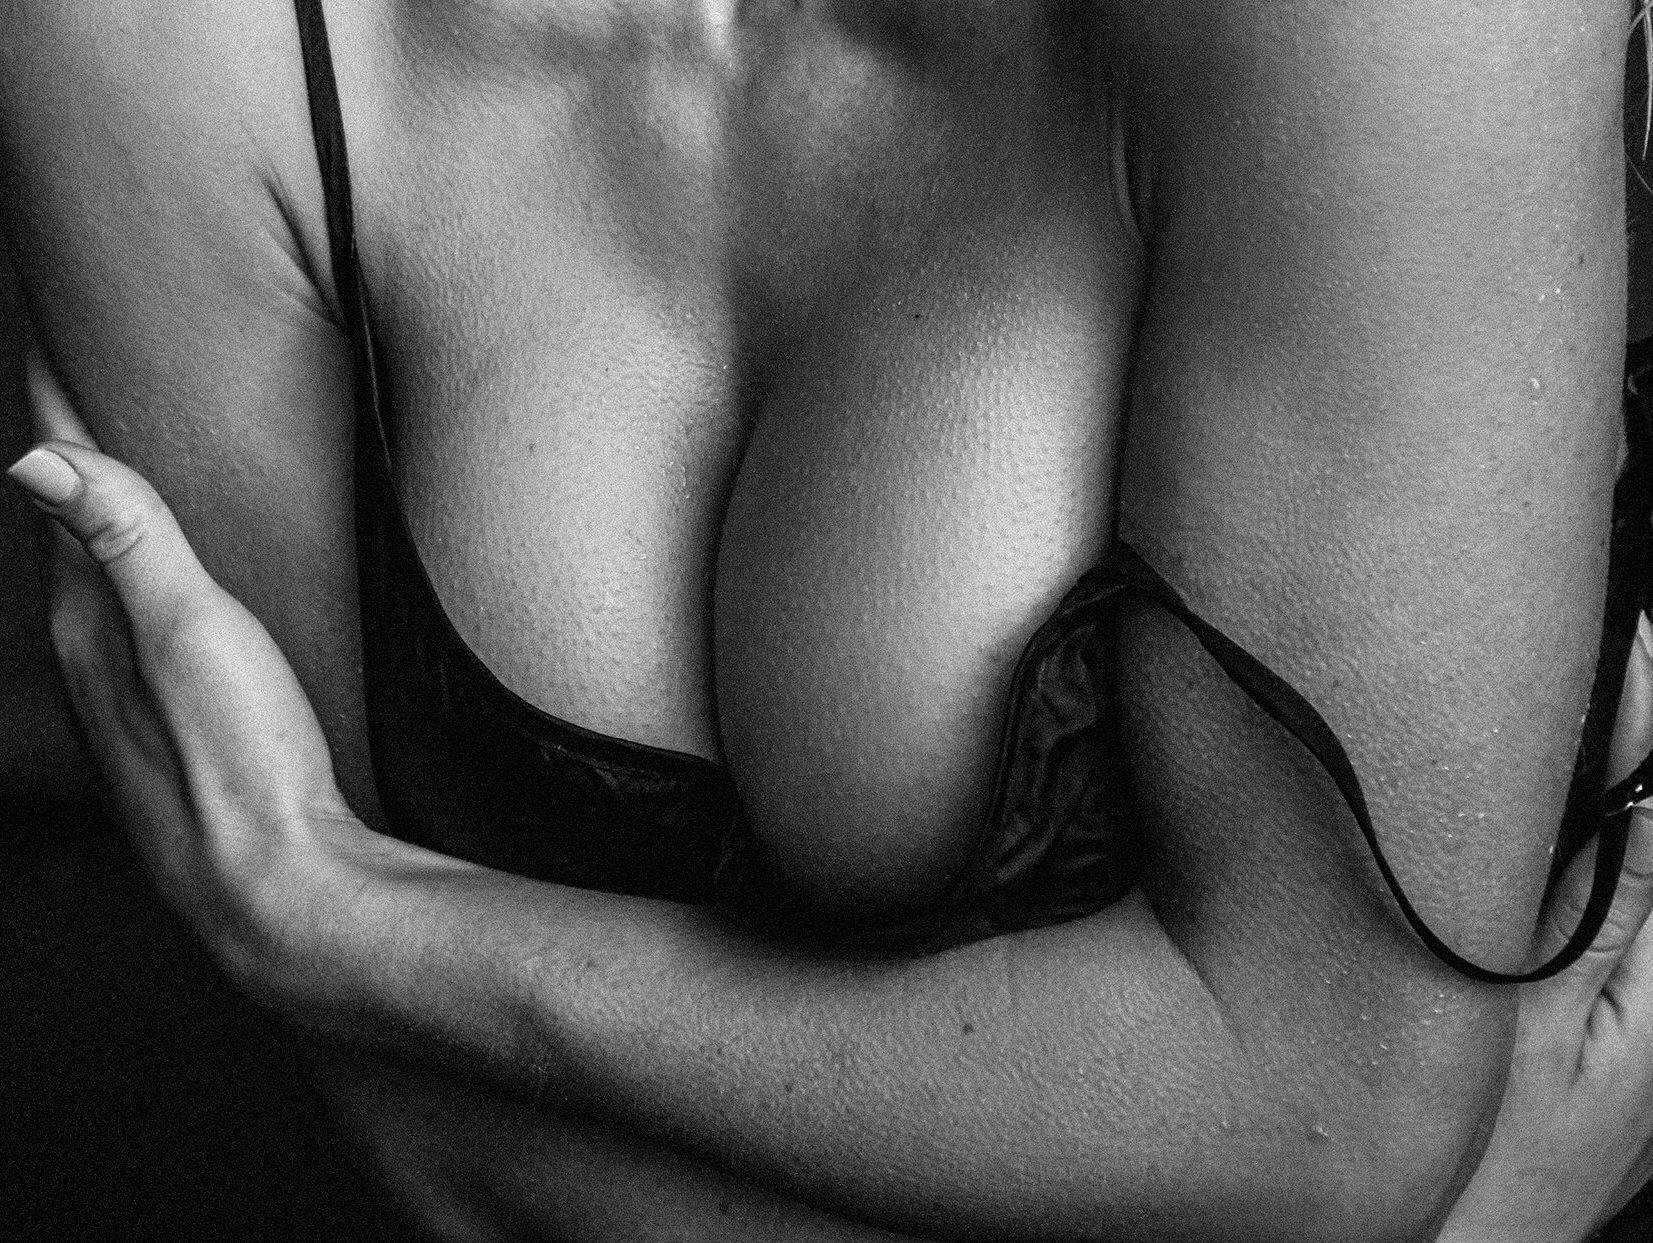 Sydney Sweeny Beautiful Boobs